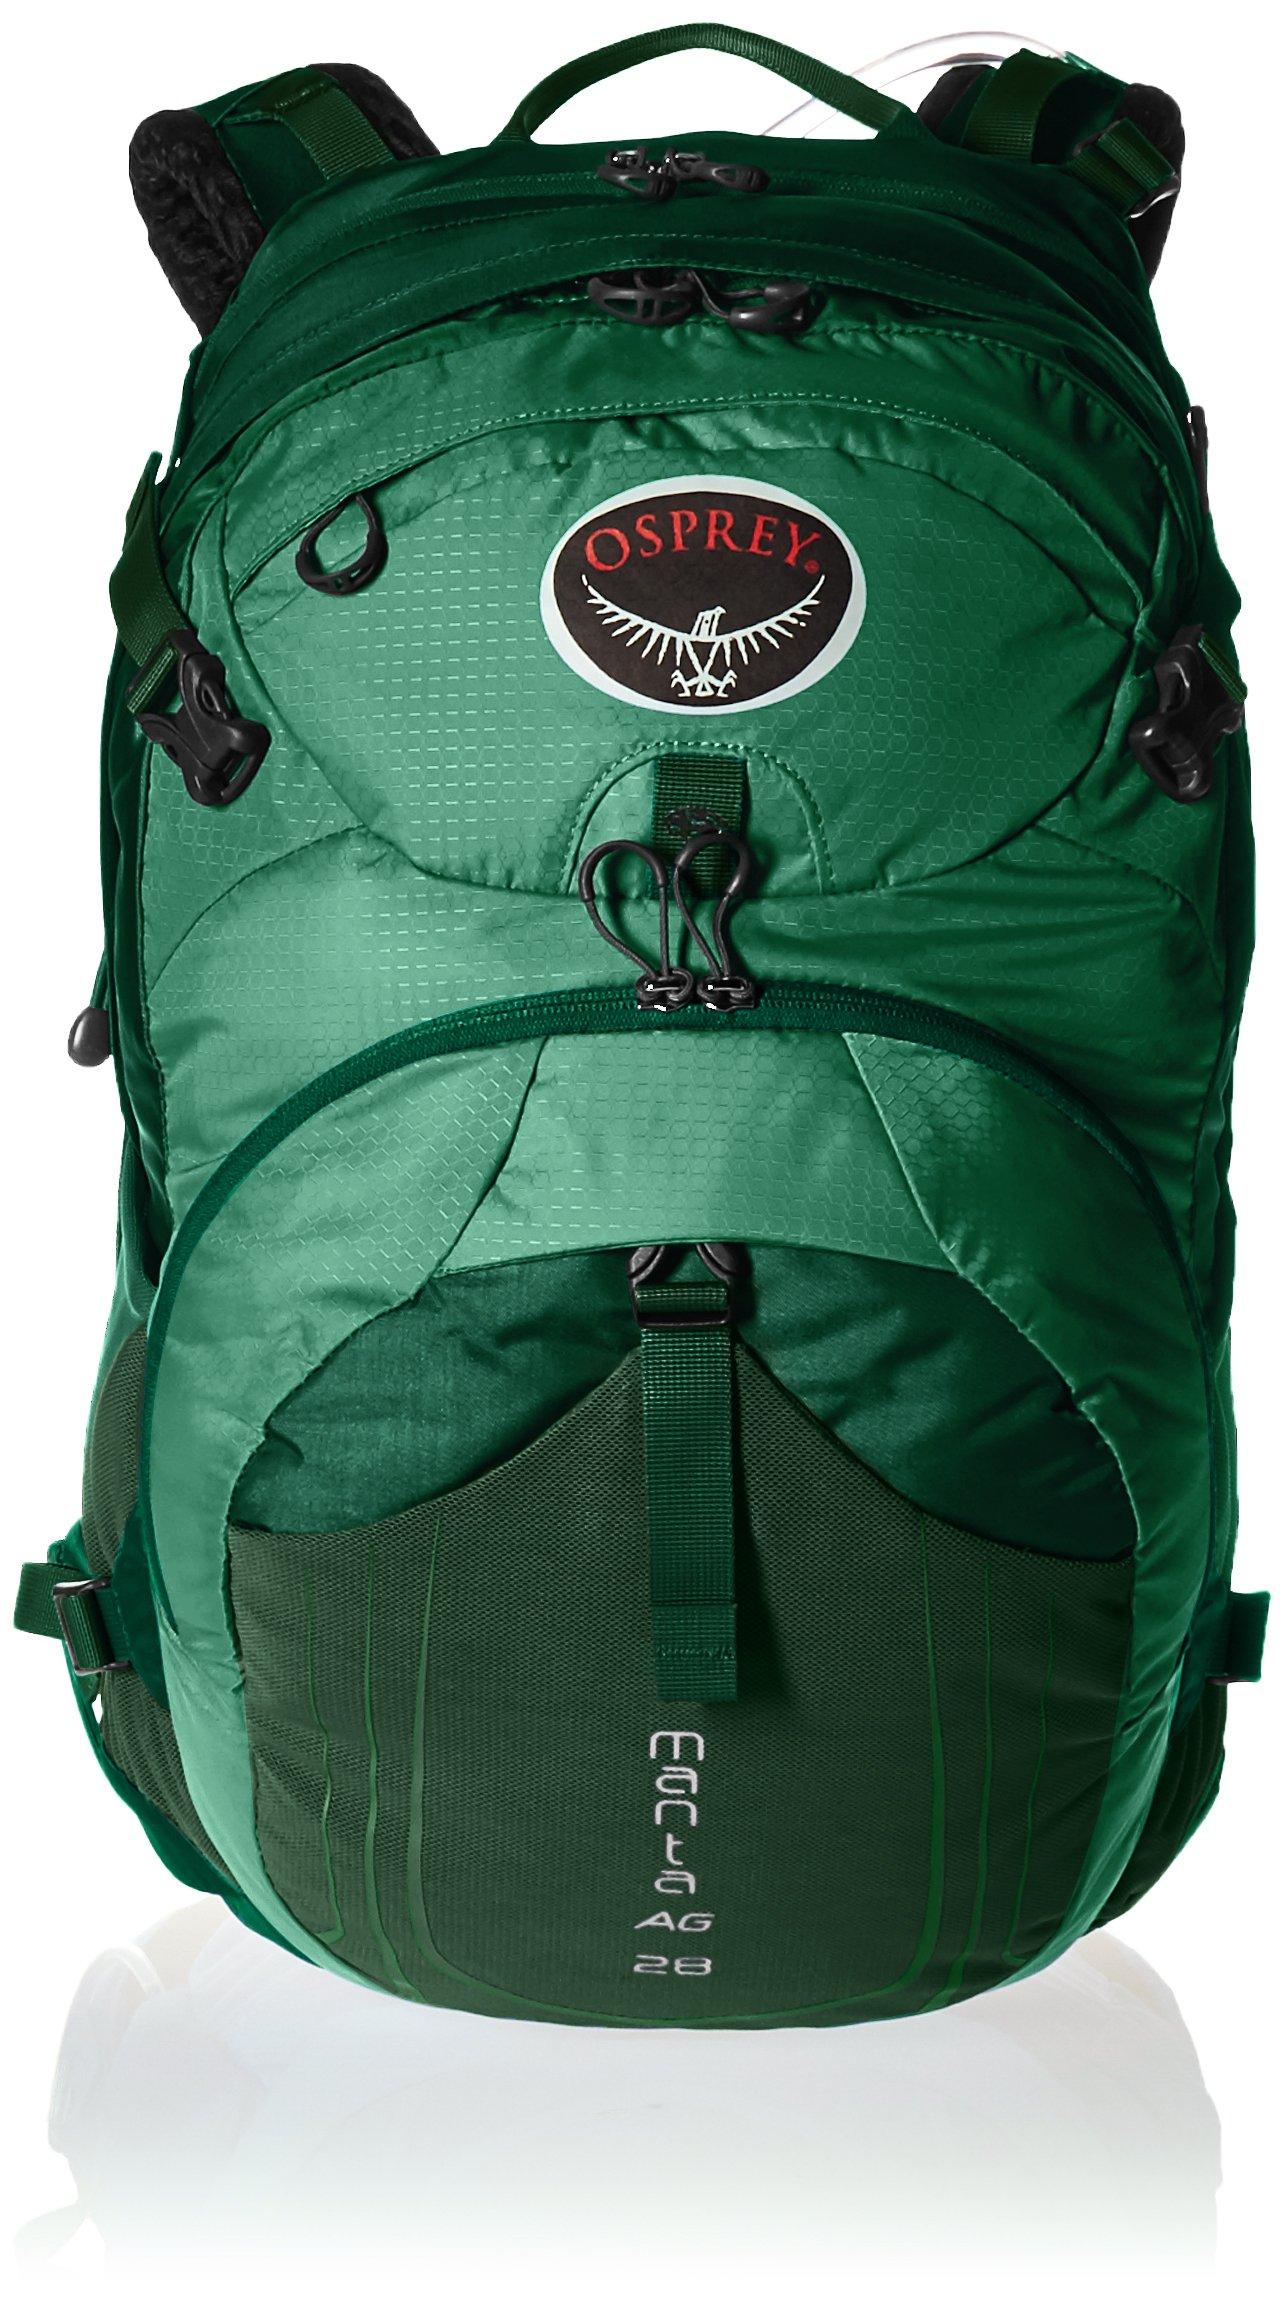 Osprey Packs Manta AG 28, Spruce Green Medium/Large